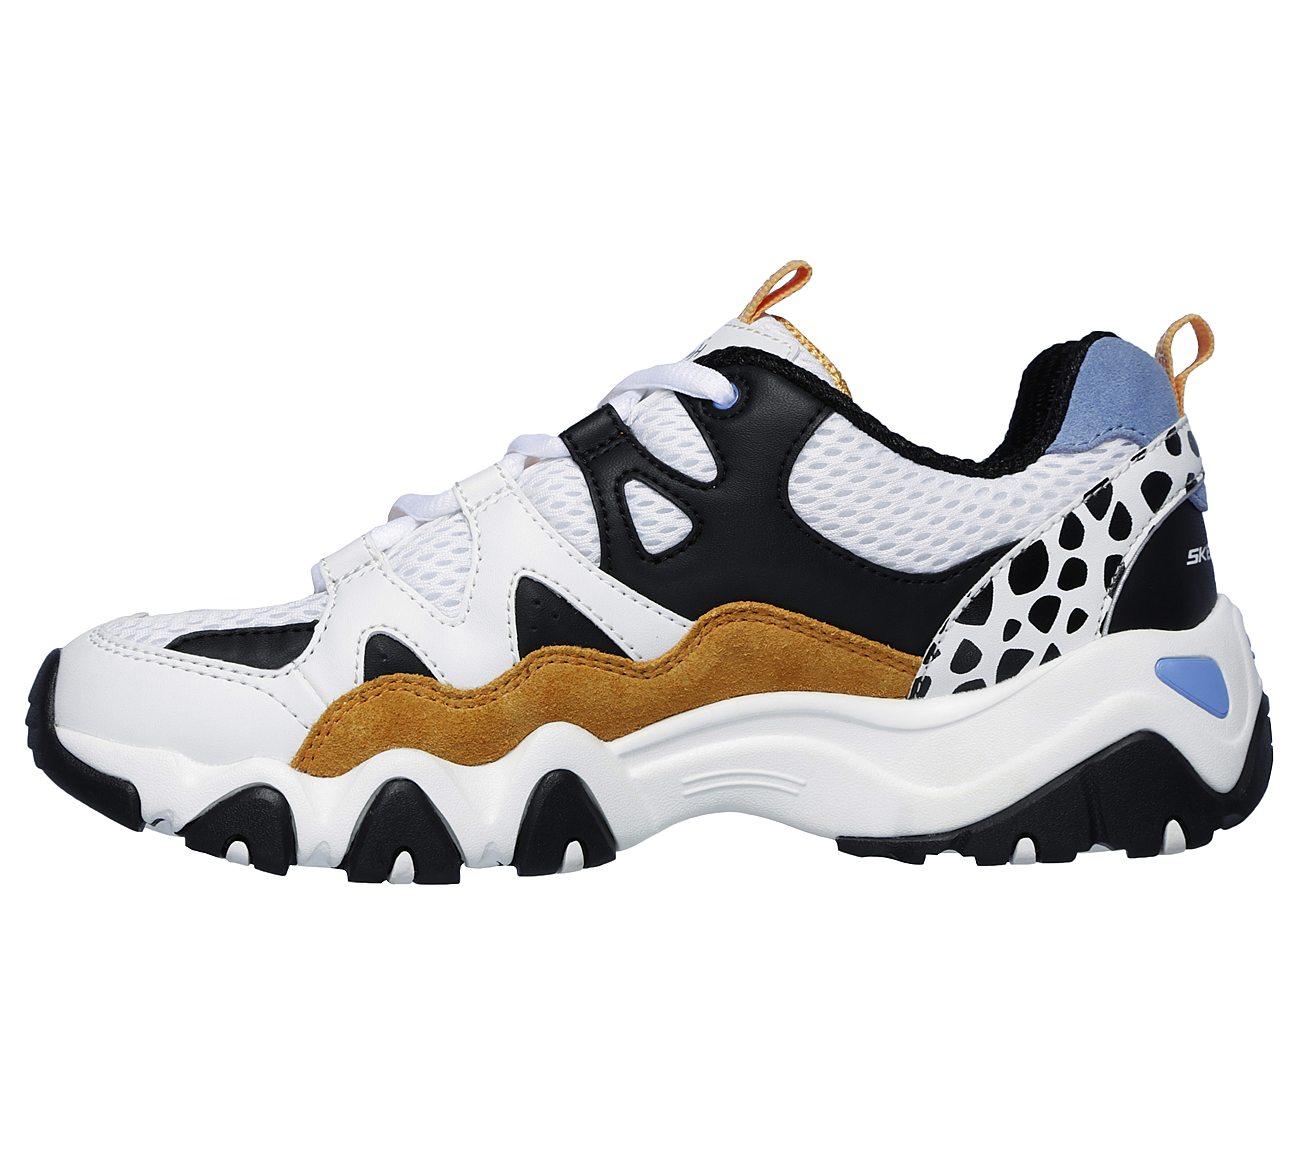 Buy SKECHERS D Lites 2 - One Piece SKECHERS Sport Shoes only £80.00 8769be4934c1